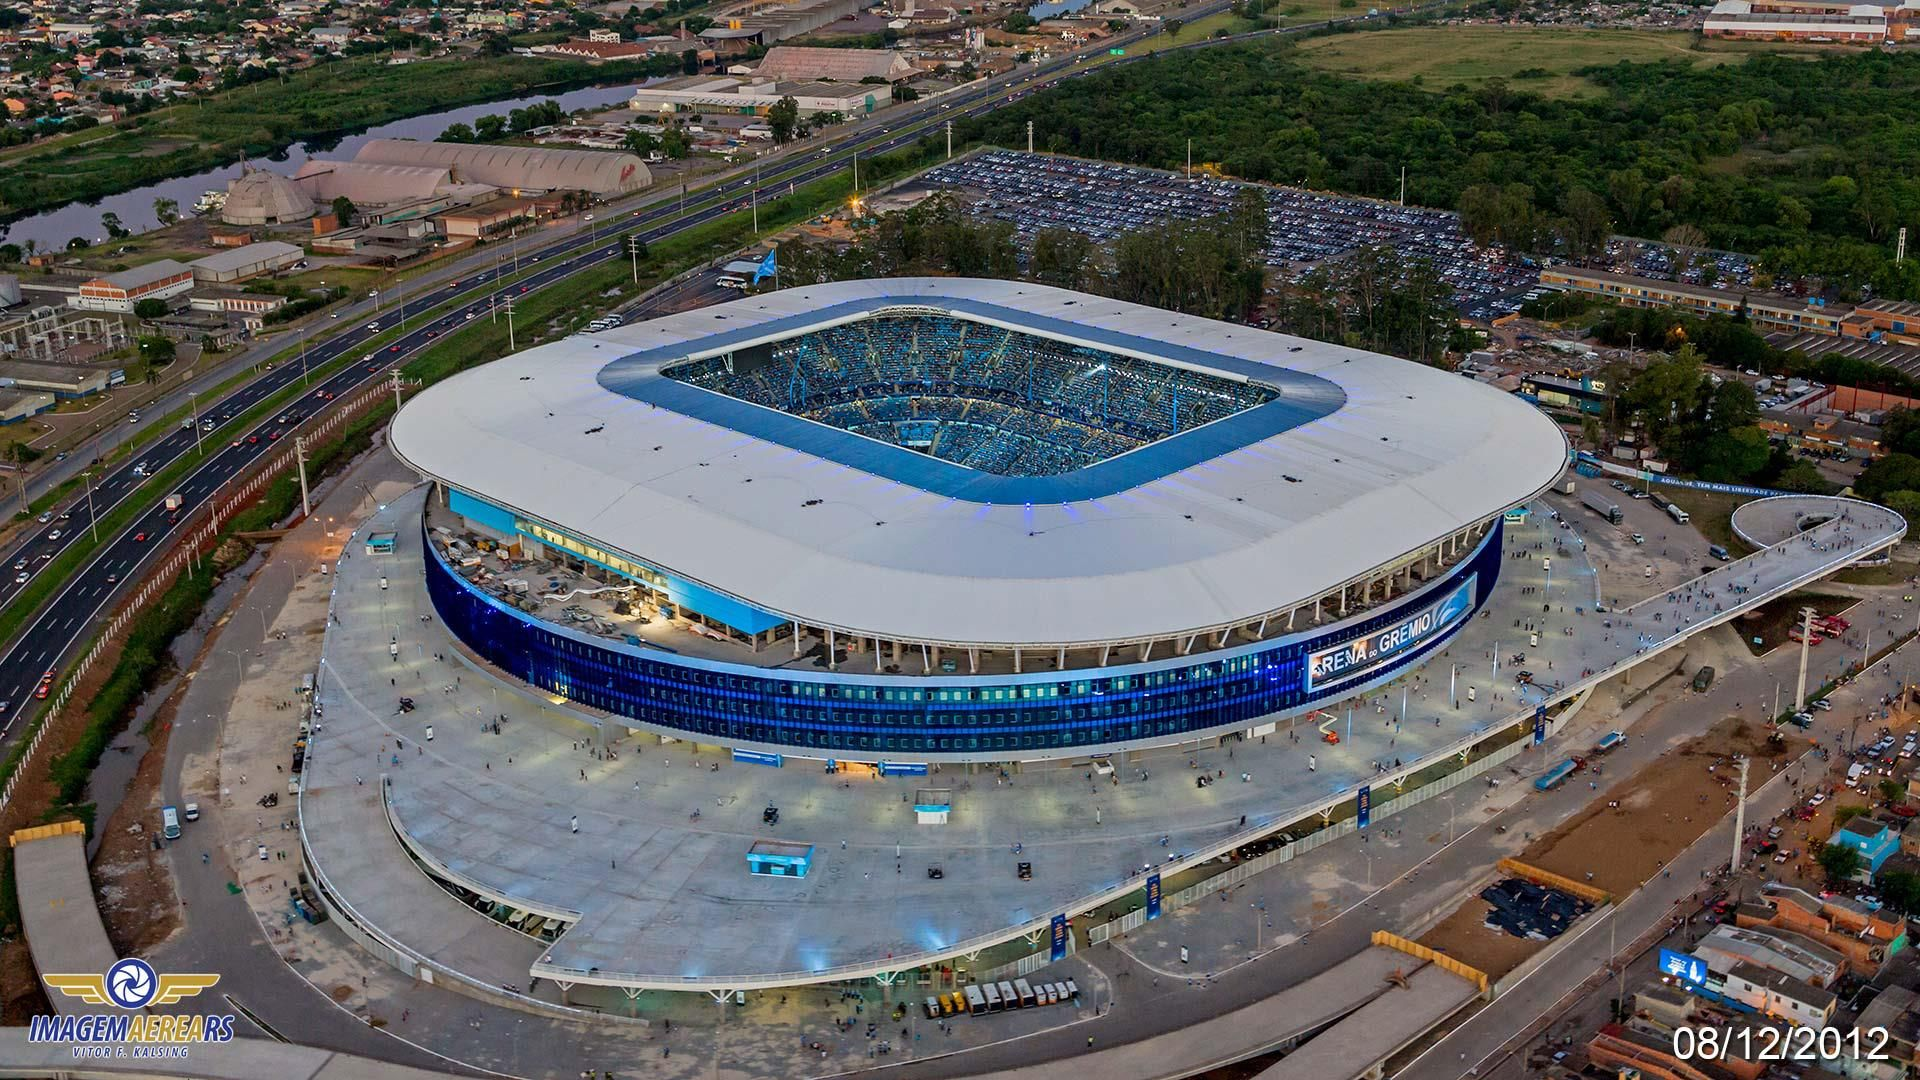 b687b5c51 Rio Grande do Sul Ciudad Porto Alegre Arena do Grêmio